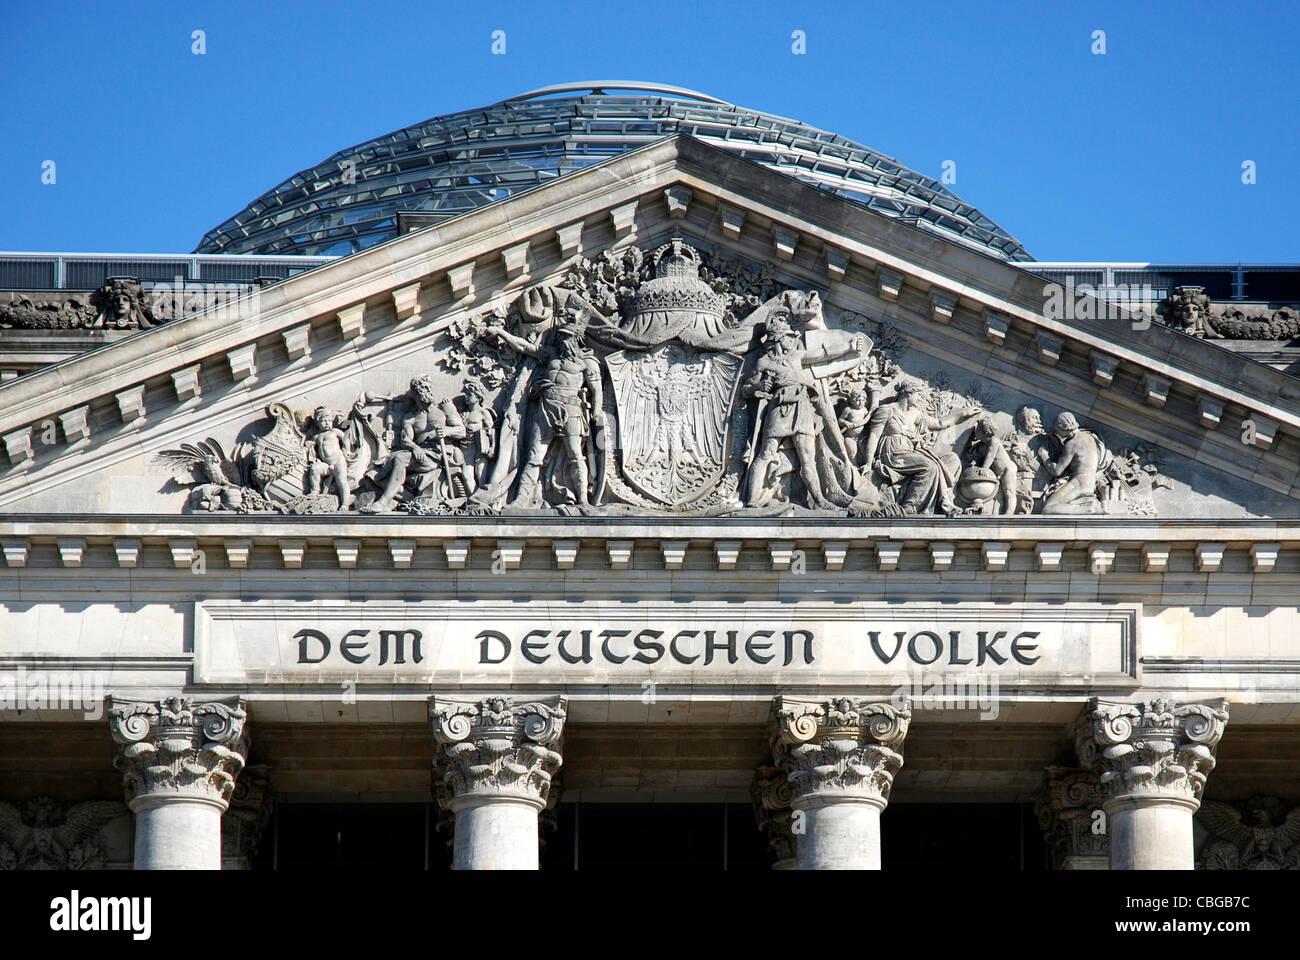 German Reichstag building in Berlin - Seat of the German Federal Parliament Bundestag. - Stock Image